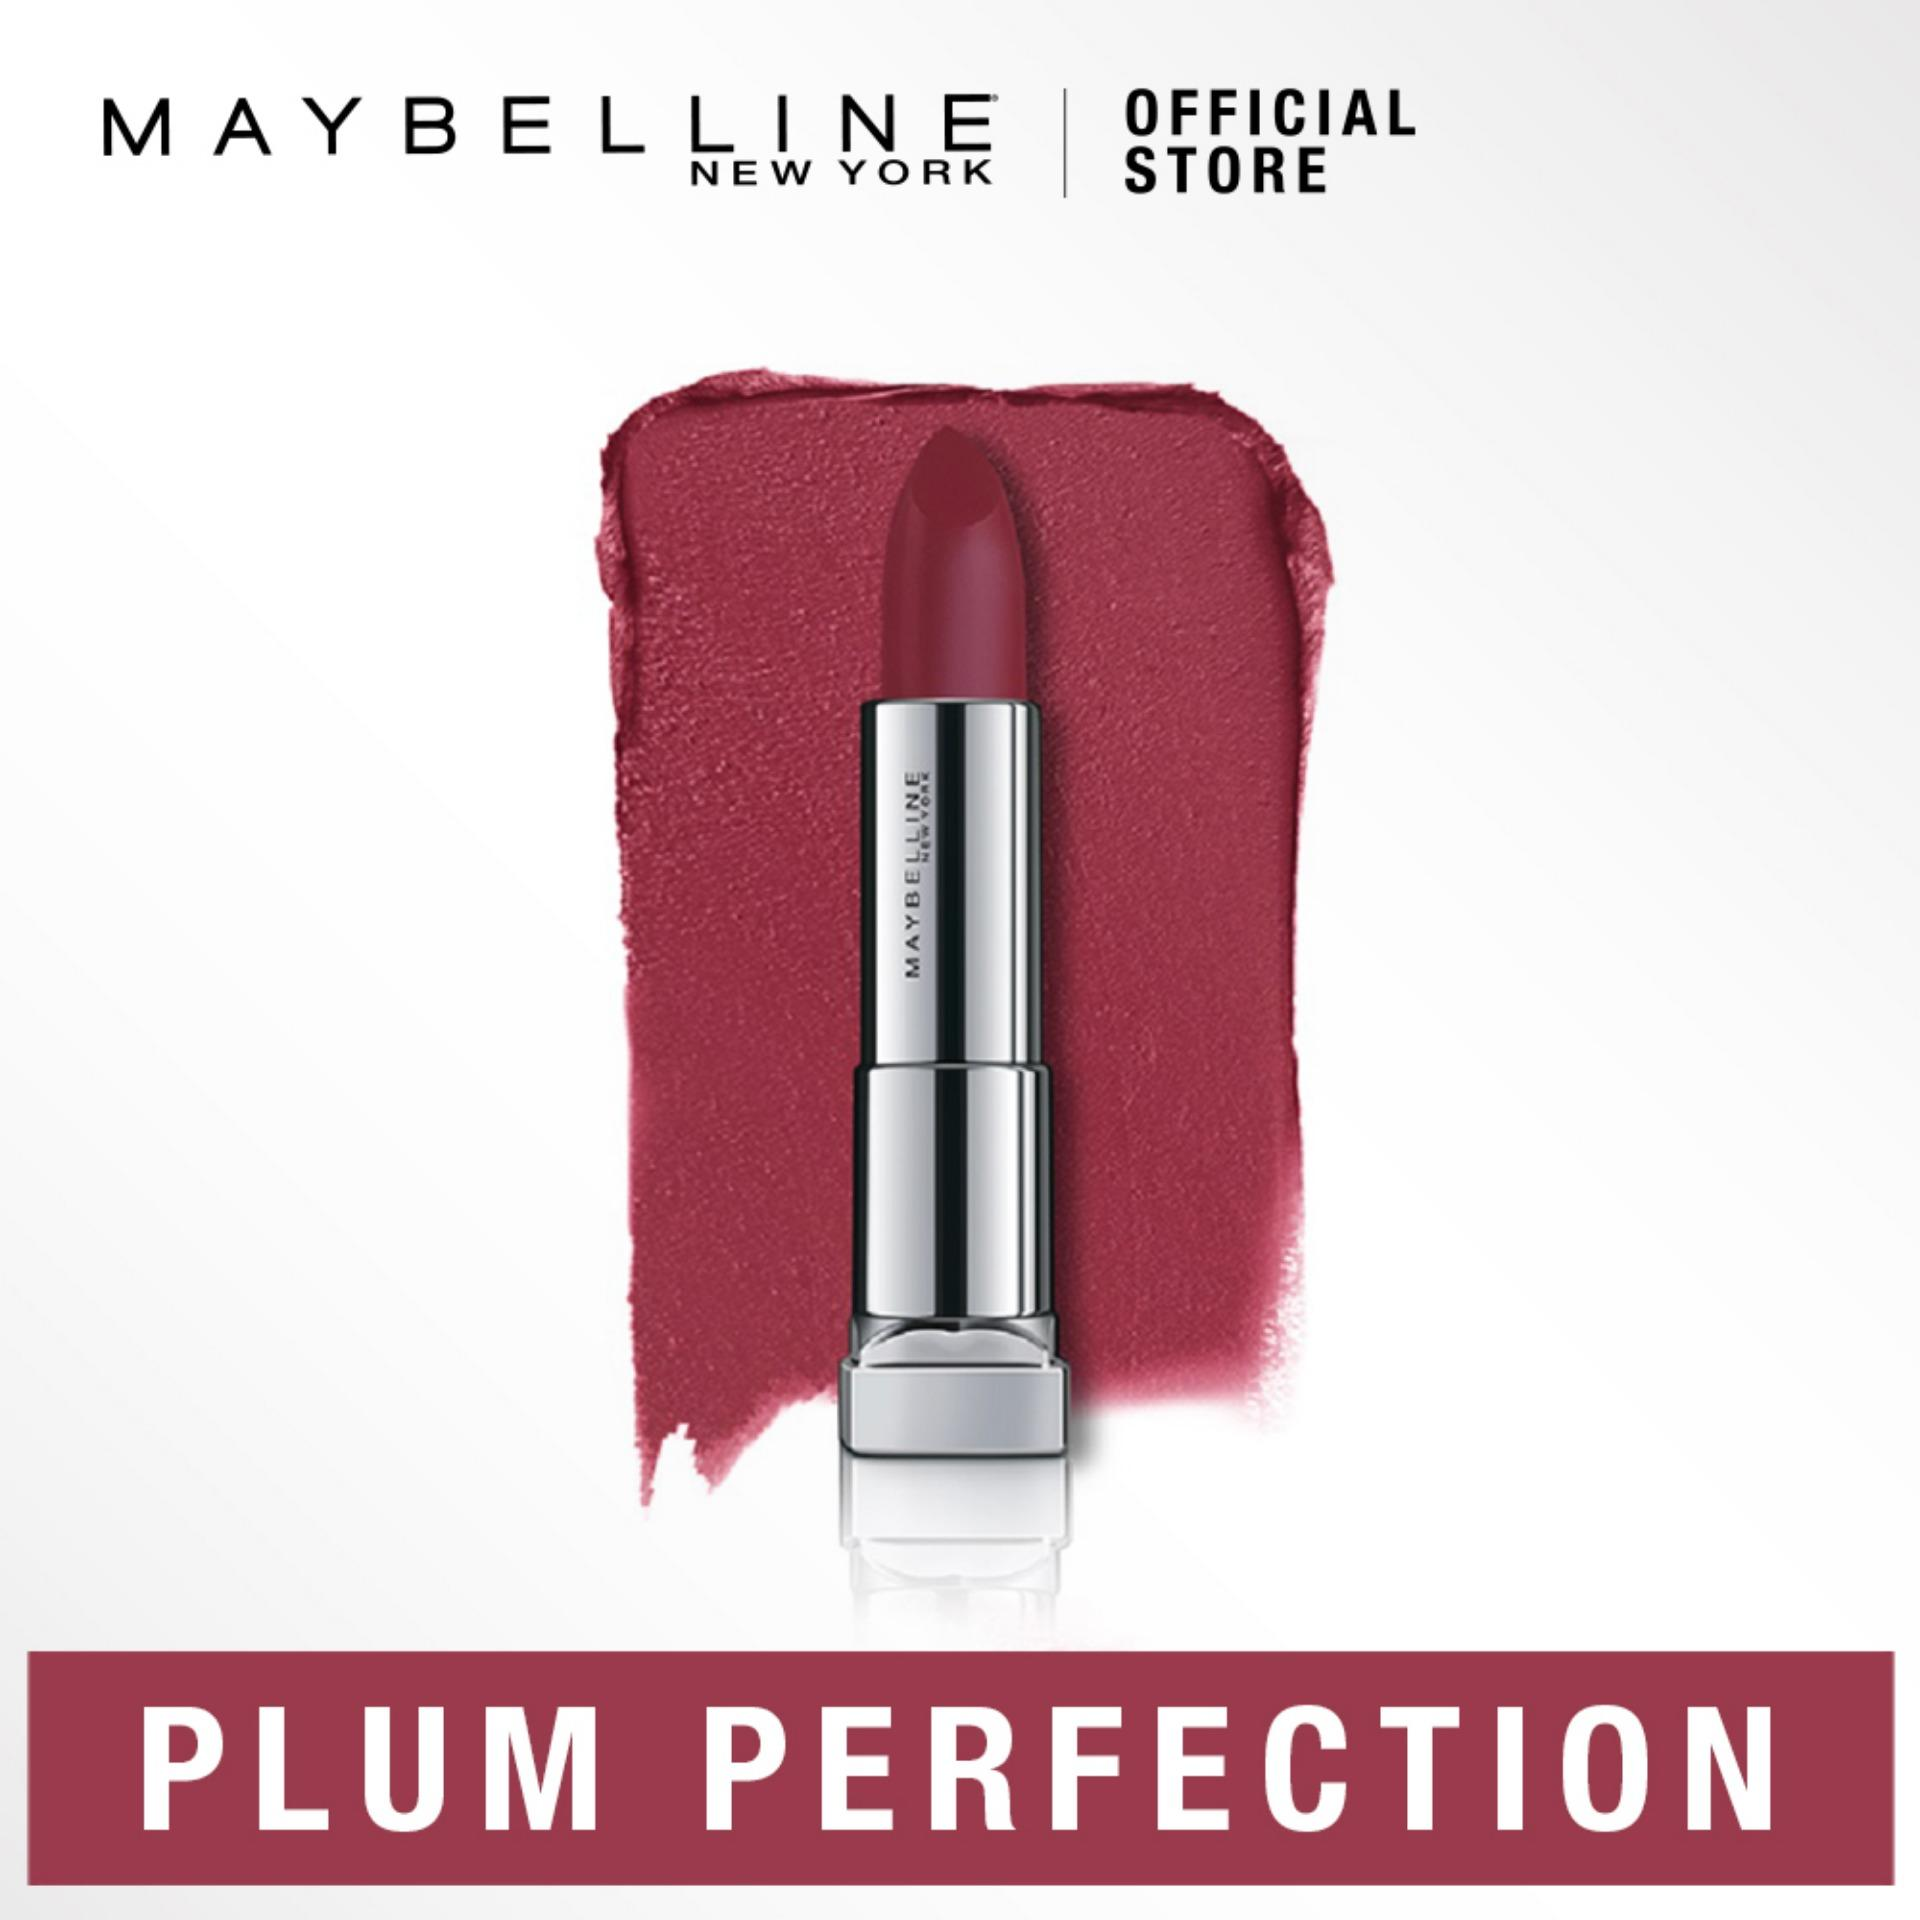 Maybelline Colorsensational Powder Matte By Maybelline.